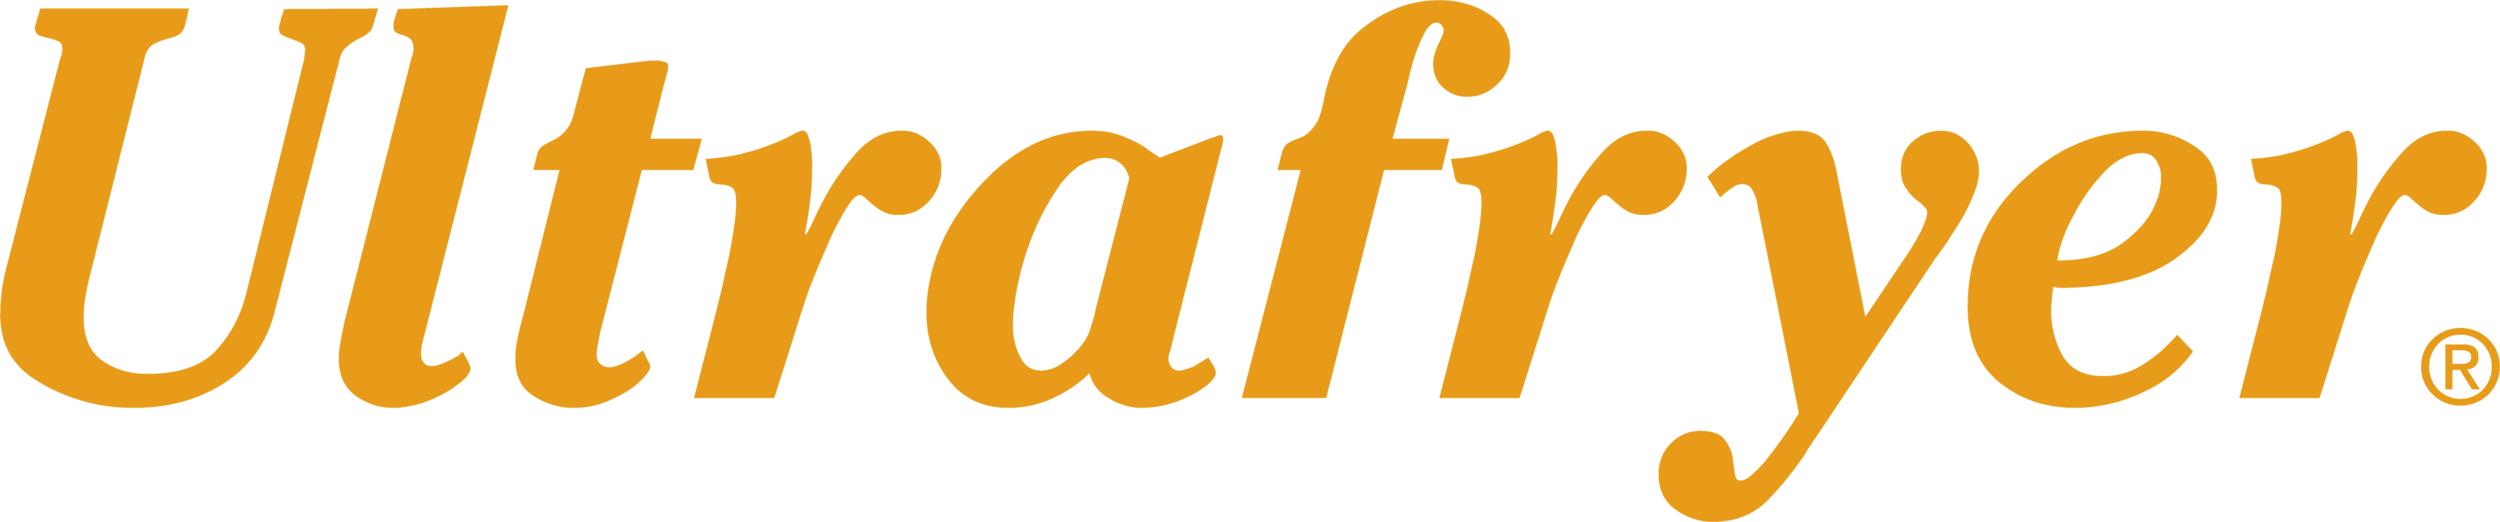 ultrafryer_logo_Gold_PMS124-1.png